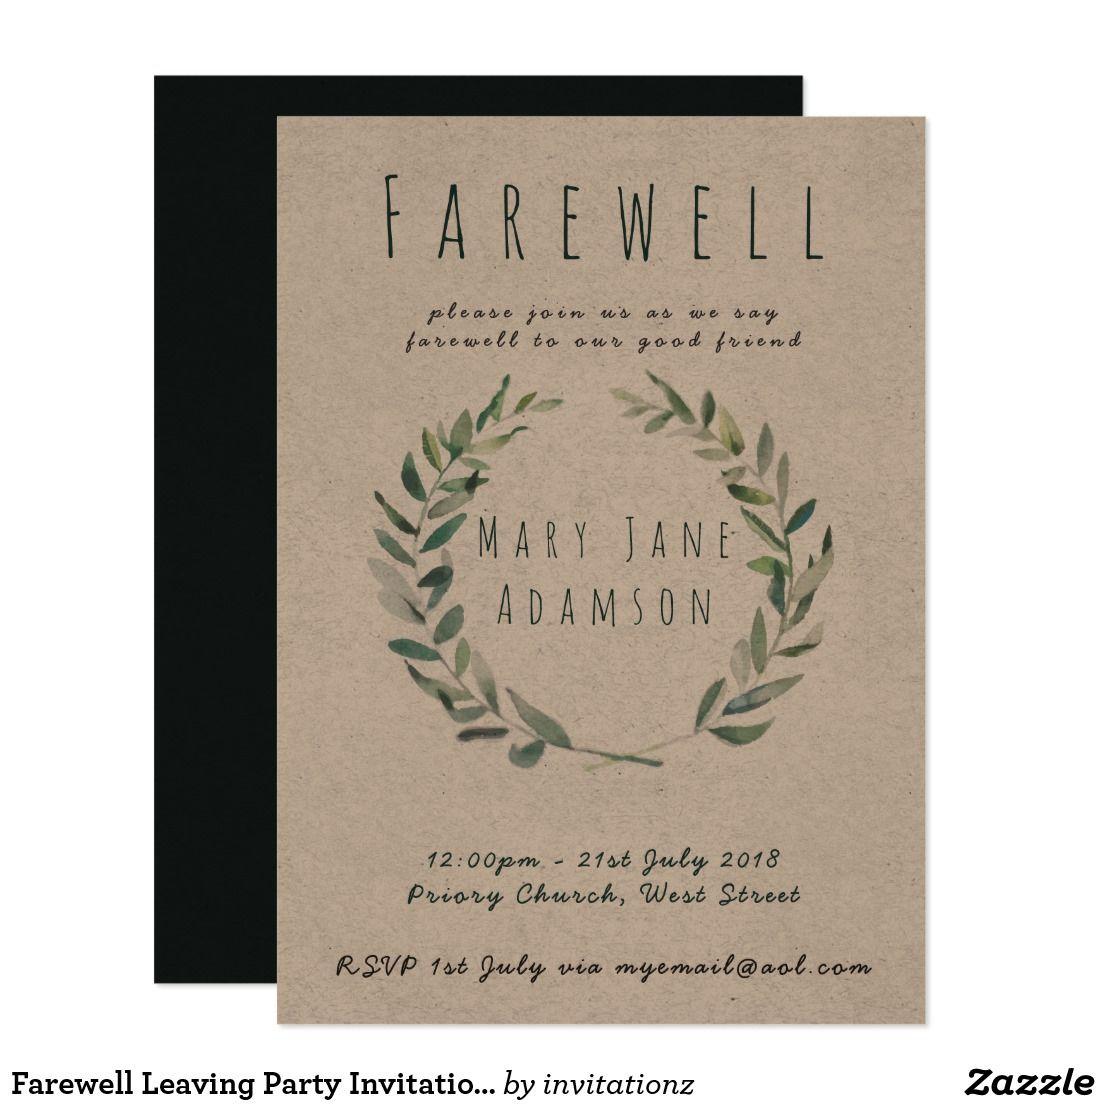 Farewell Leaving Party Invitation Botanical Kraft   Generators